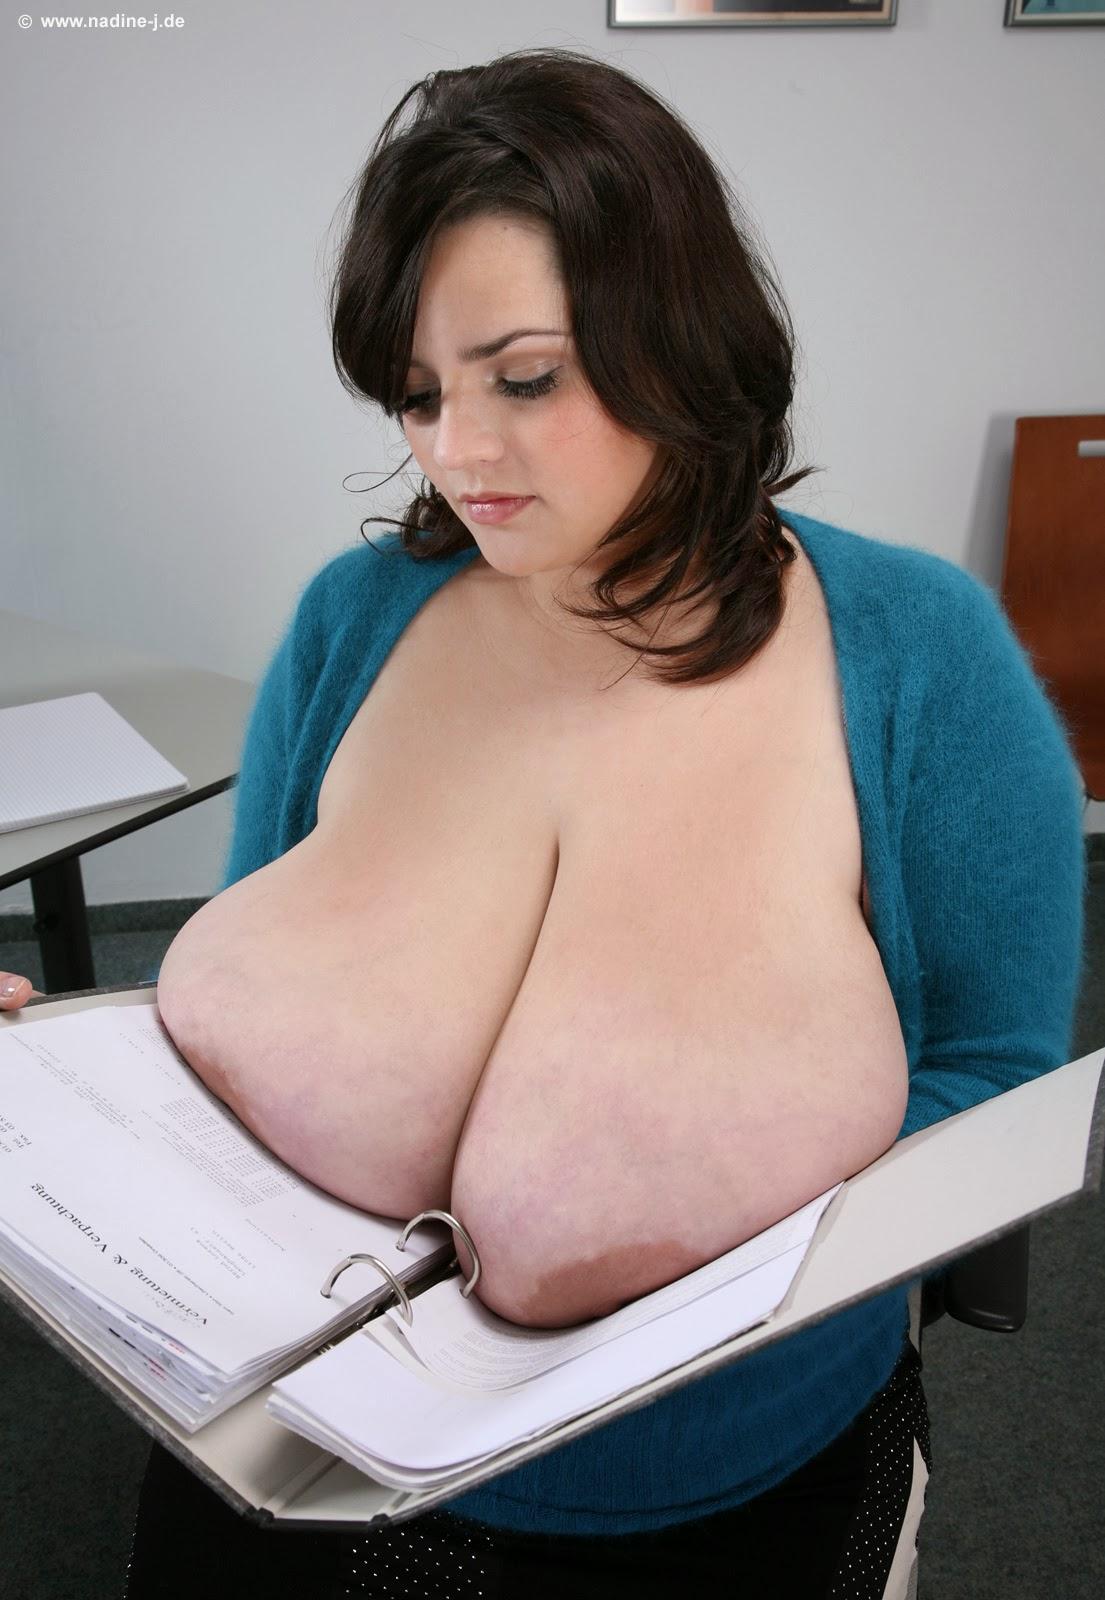 Nikita Nadine De Models Erotic Girls